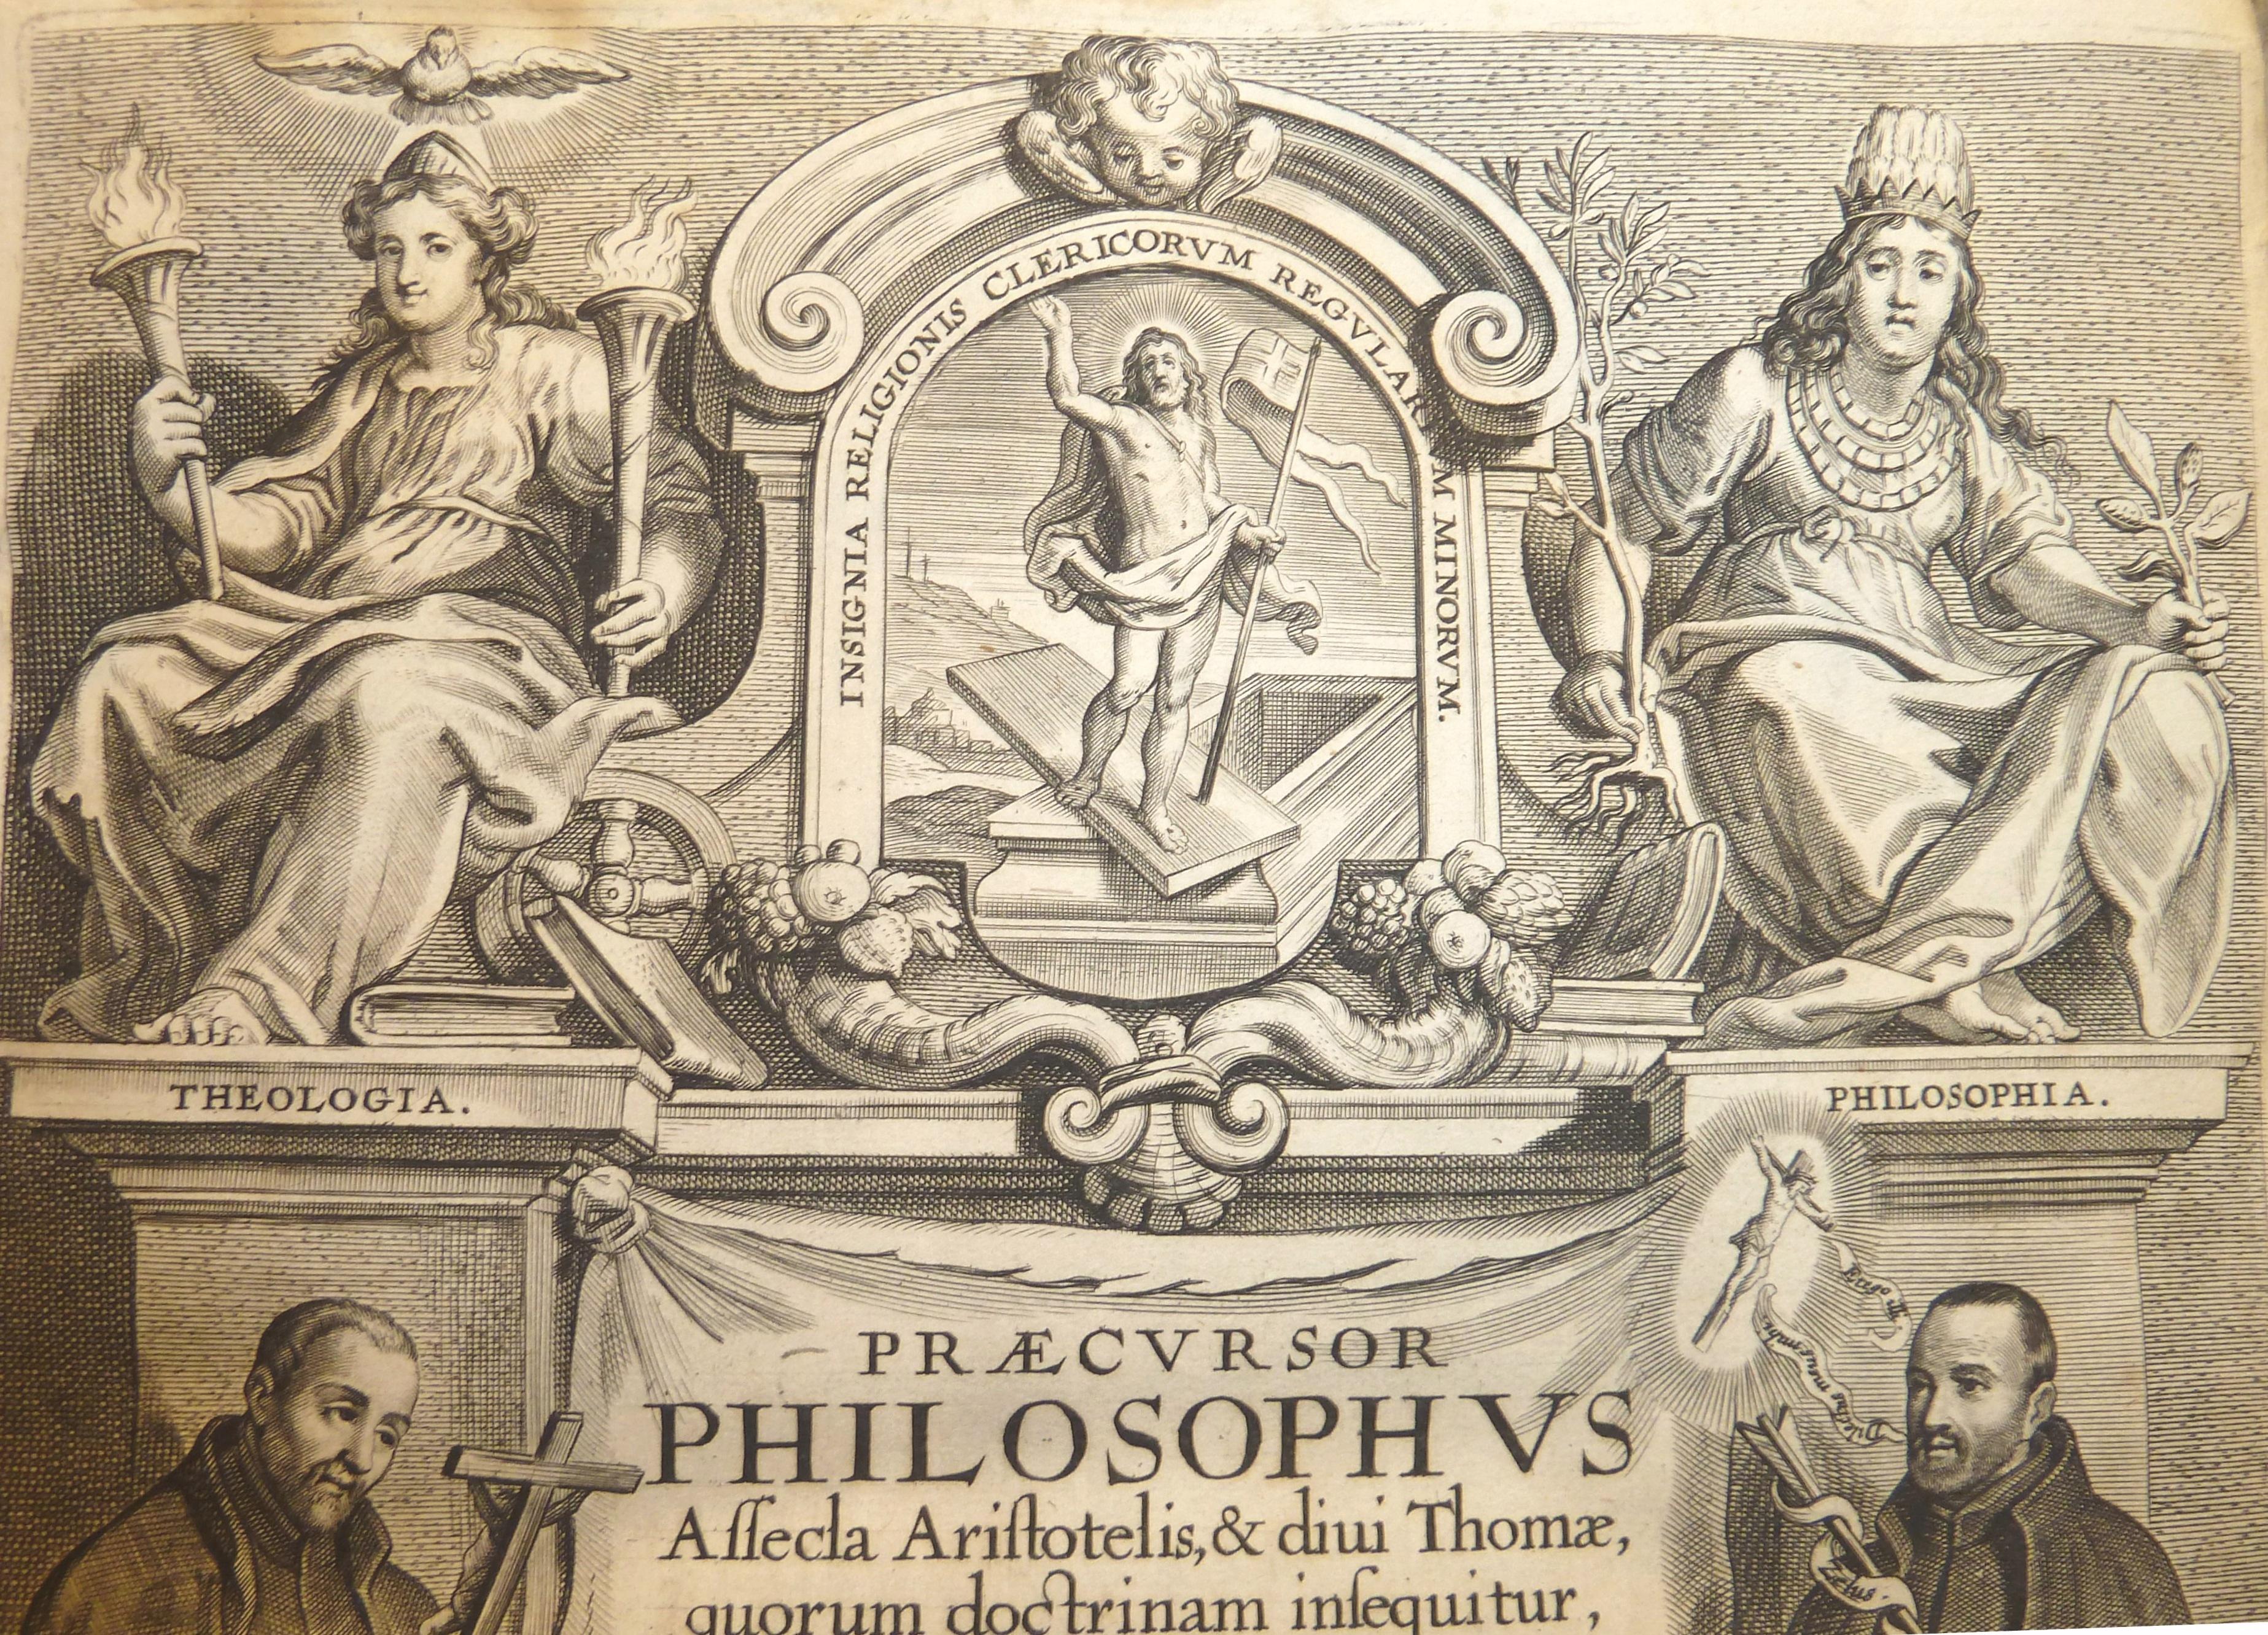 GrC Ar466 T3 1641 Folio, Ancient, Architecture, Book, Cartoon, HQ Photo